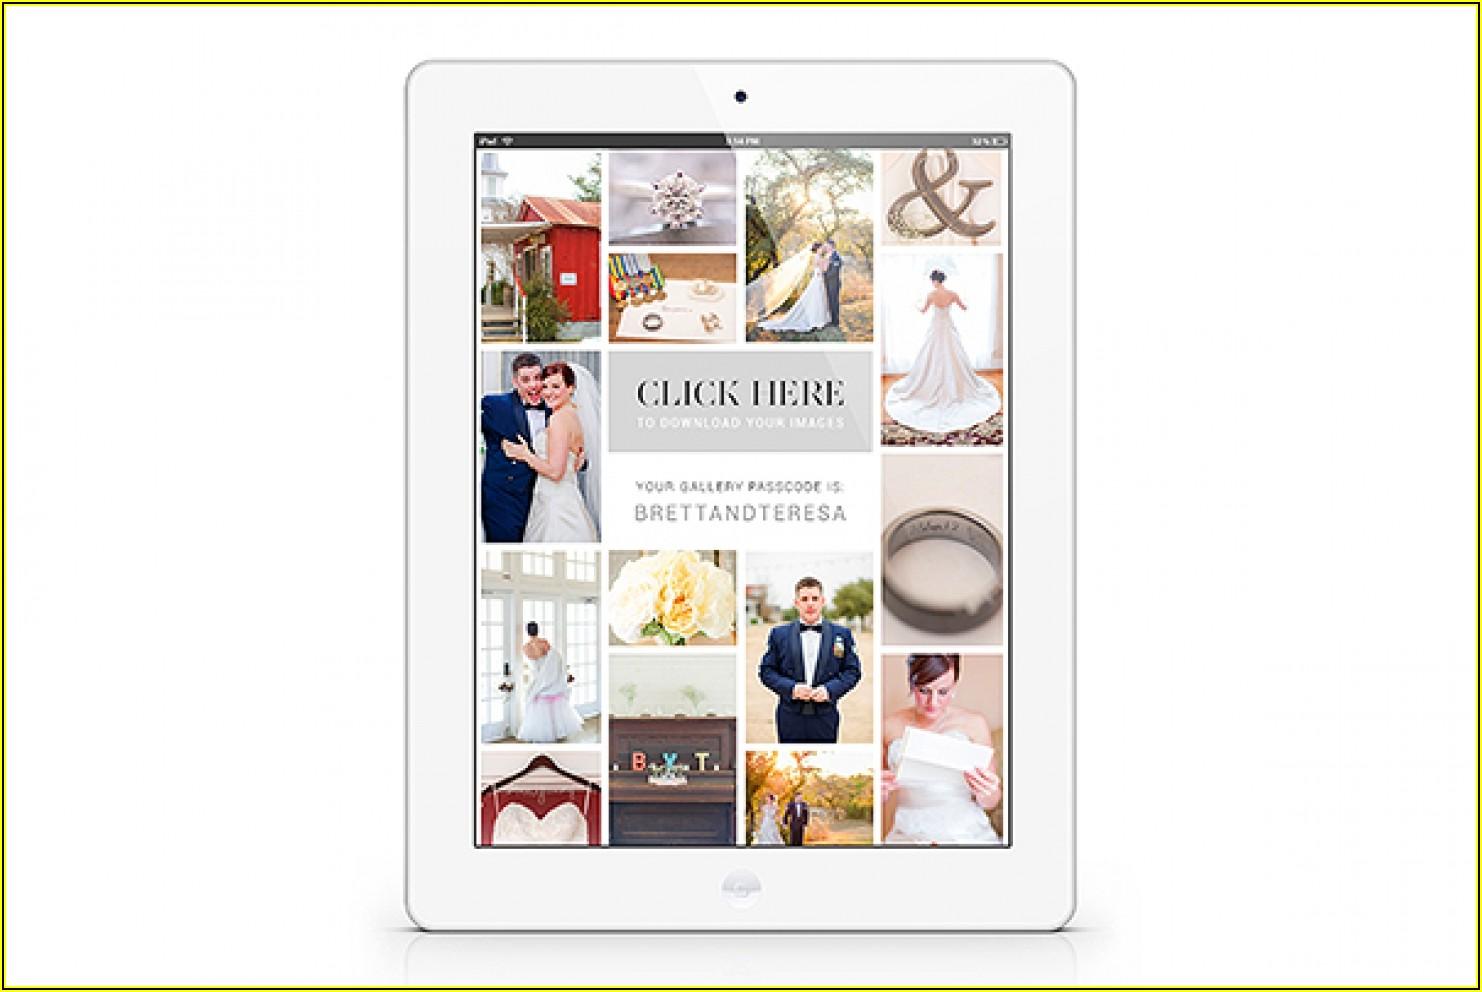 Digital Marketing Templates For Photographers